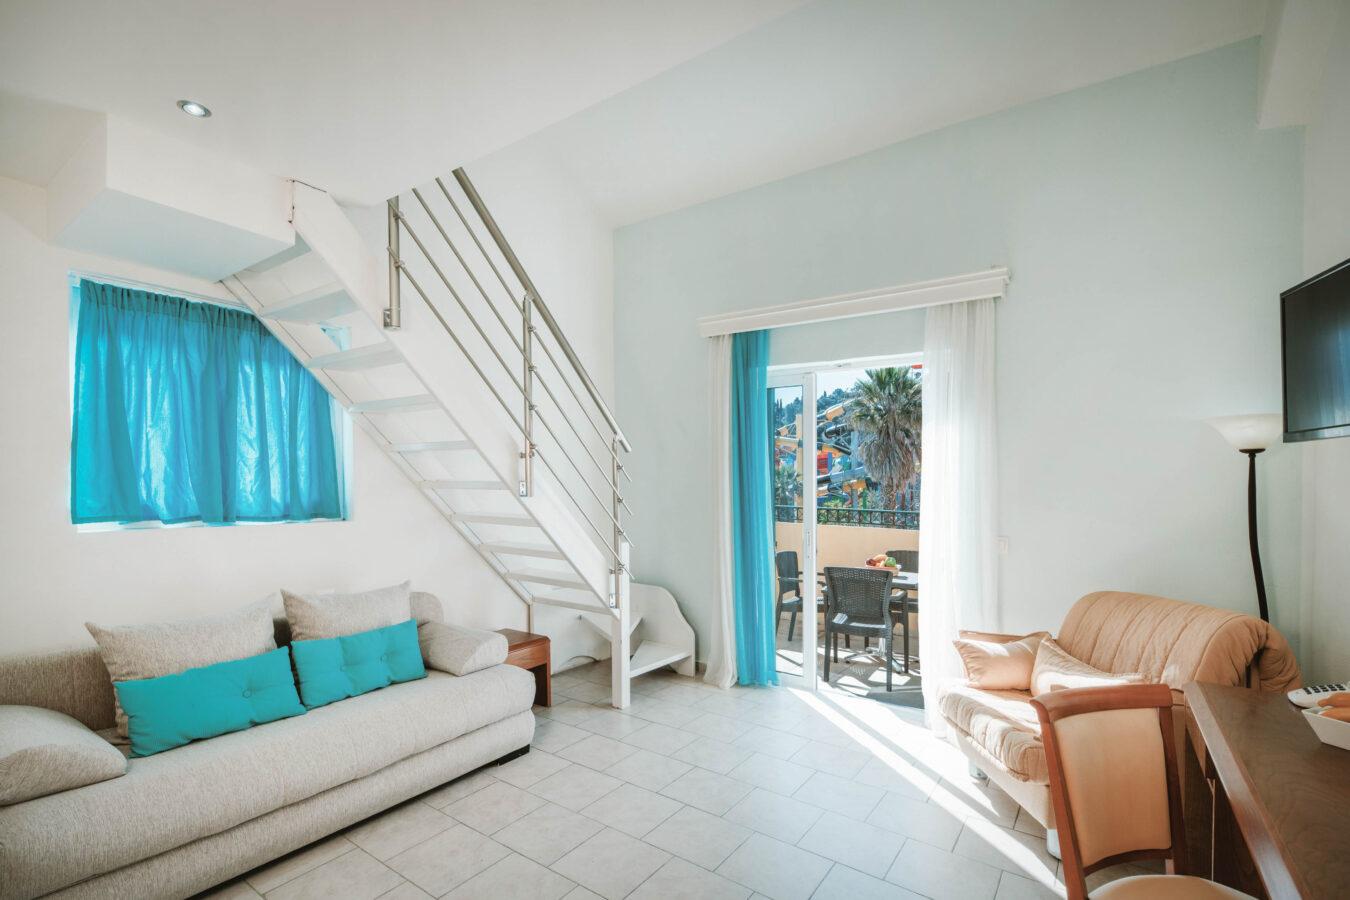 Aqualand Hotel in Corfu 72 scaled